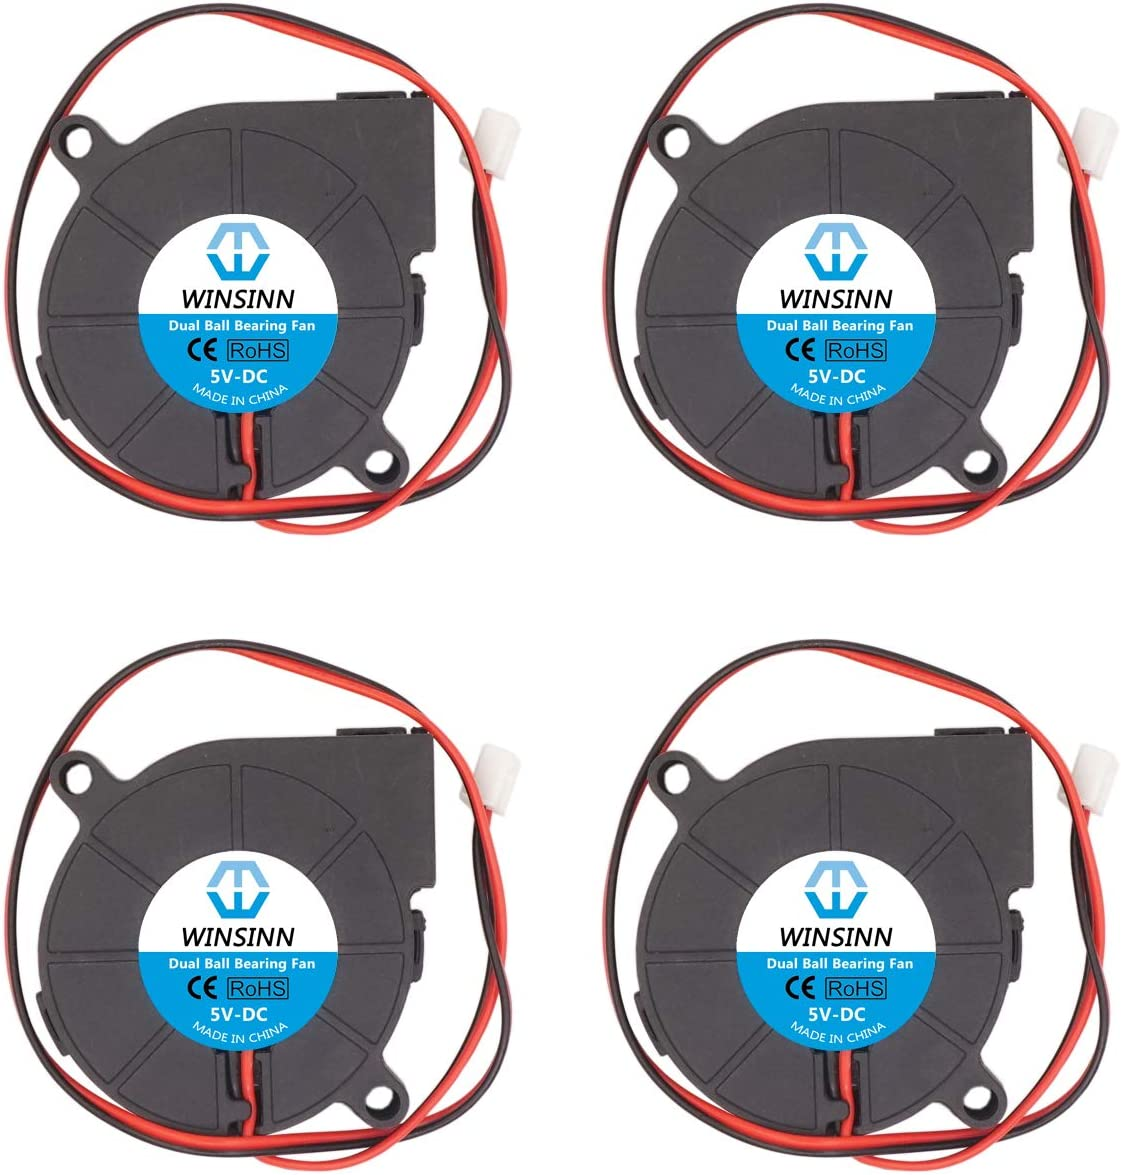 WINSINN 50mm Blower Fan 5V 5015 Dual Ball Bearing 50x15mm Turbine Turbo Brushless for Cooling PC CPU - High Speed (Pack of 4Pcs)